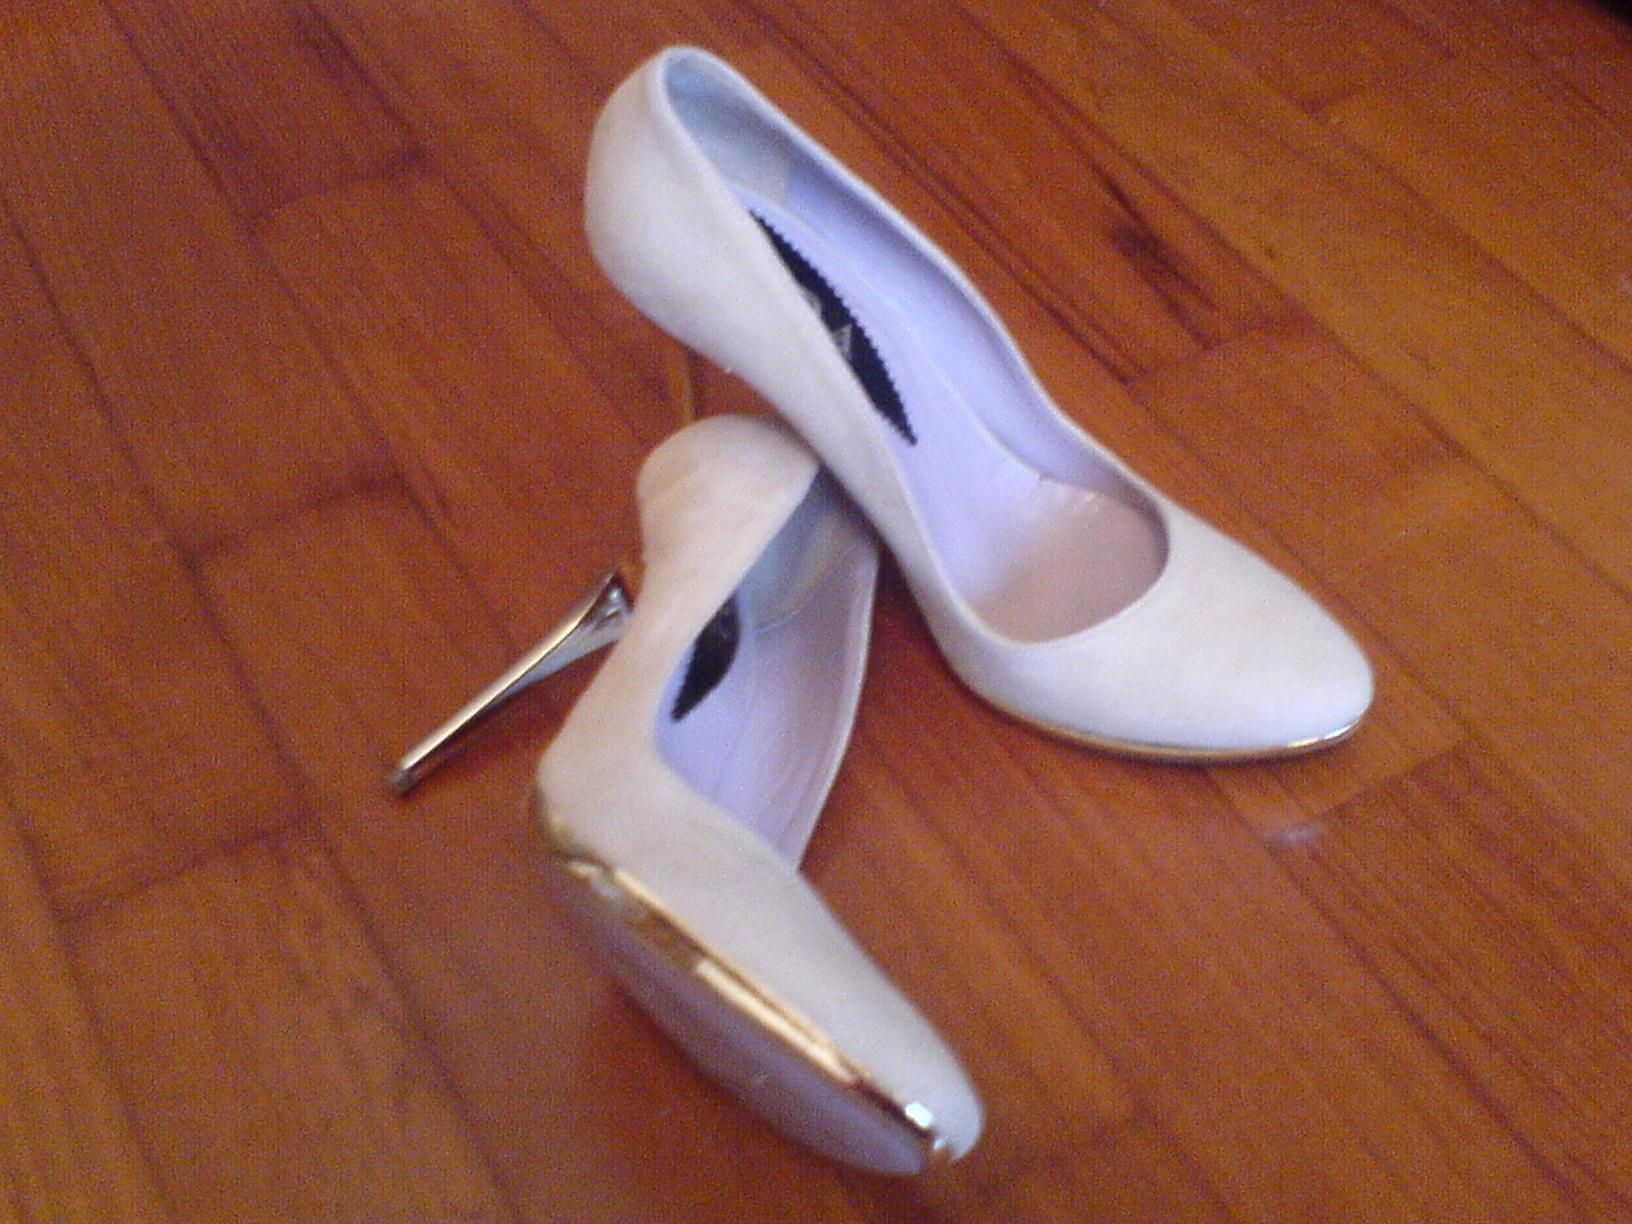 Shoe Contest 2012: finalmente le foto Shoeplay Fashion